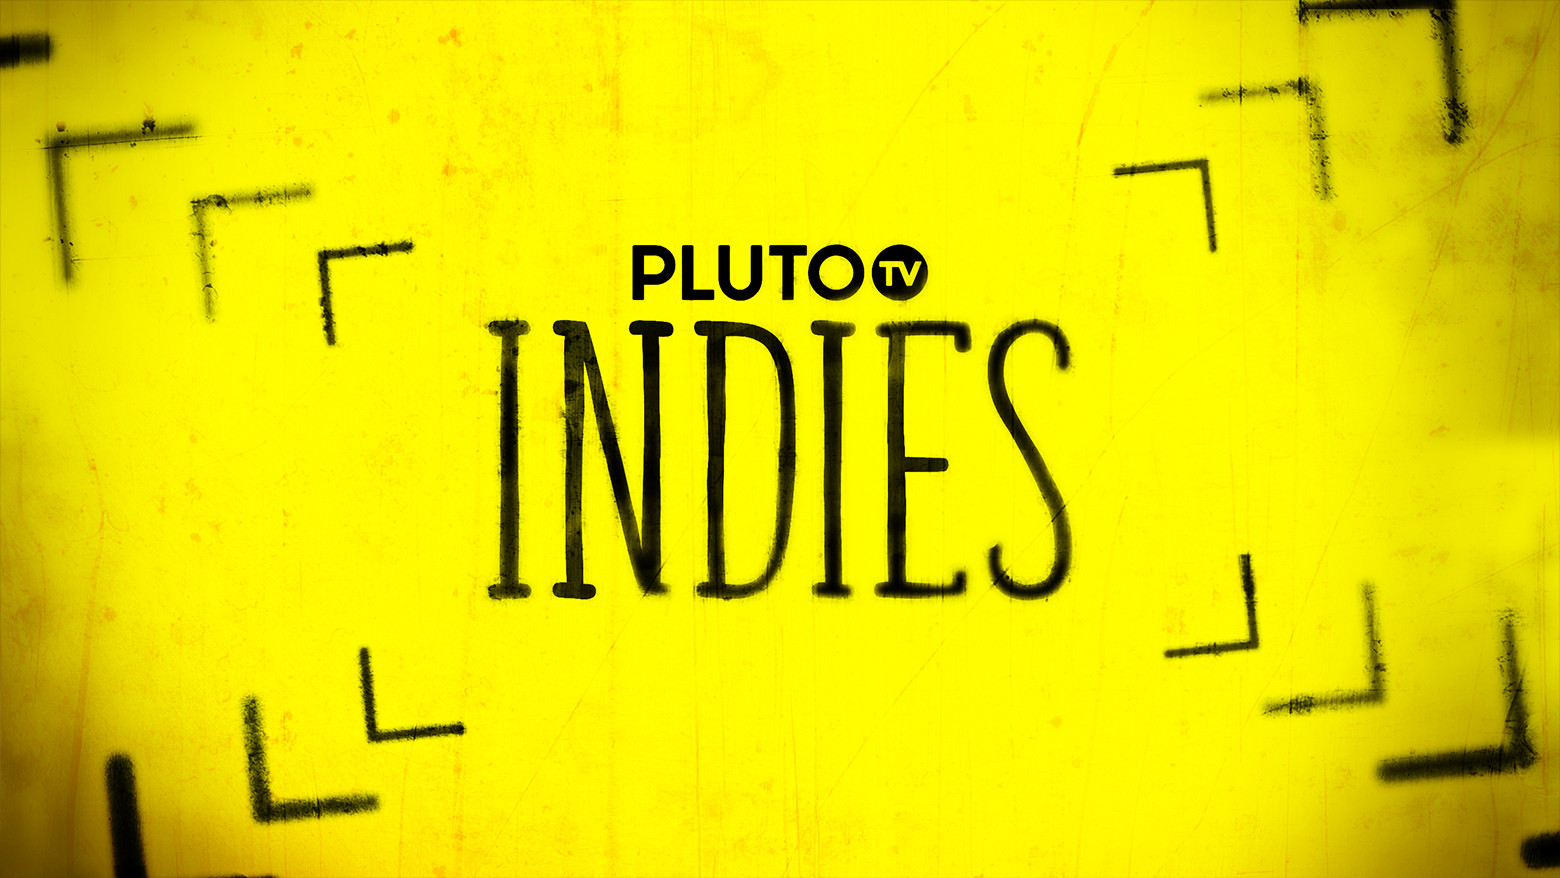 Pluto TV Indies_Featured Image.jpg